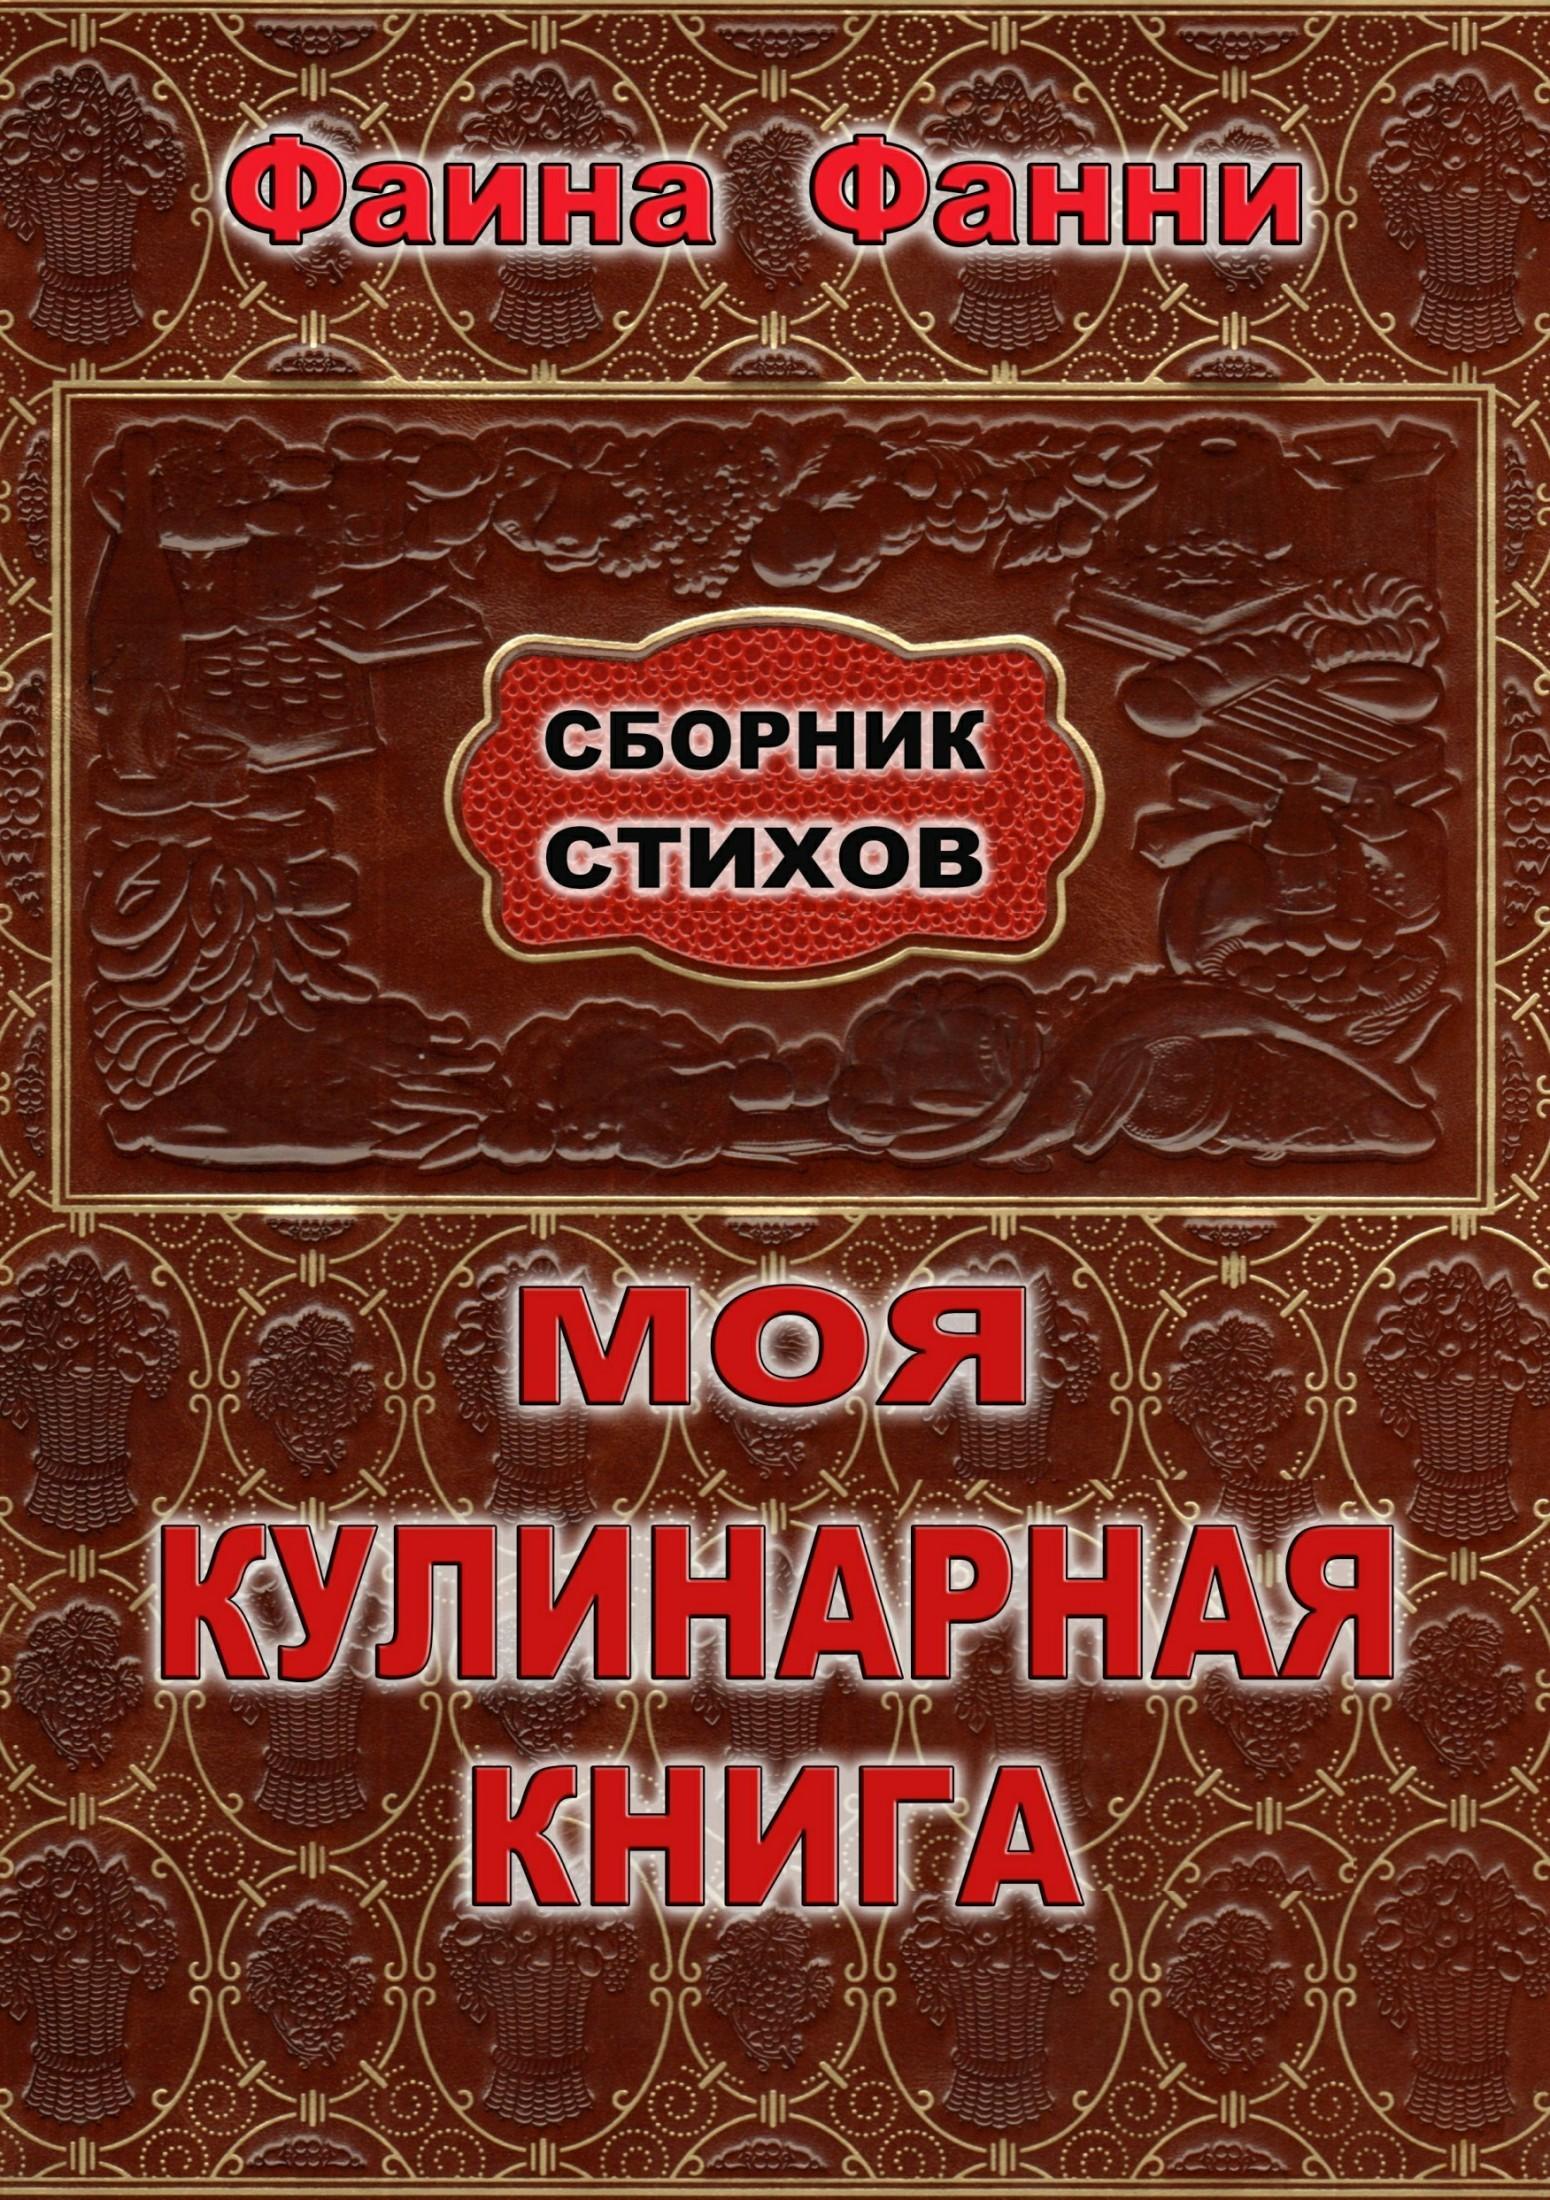 Фаина Фанни Моя кулинарная книга. Сборник стихов